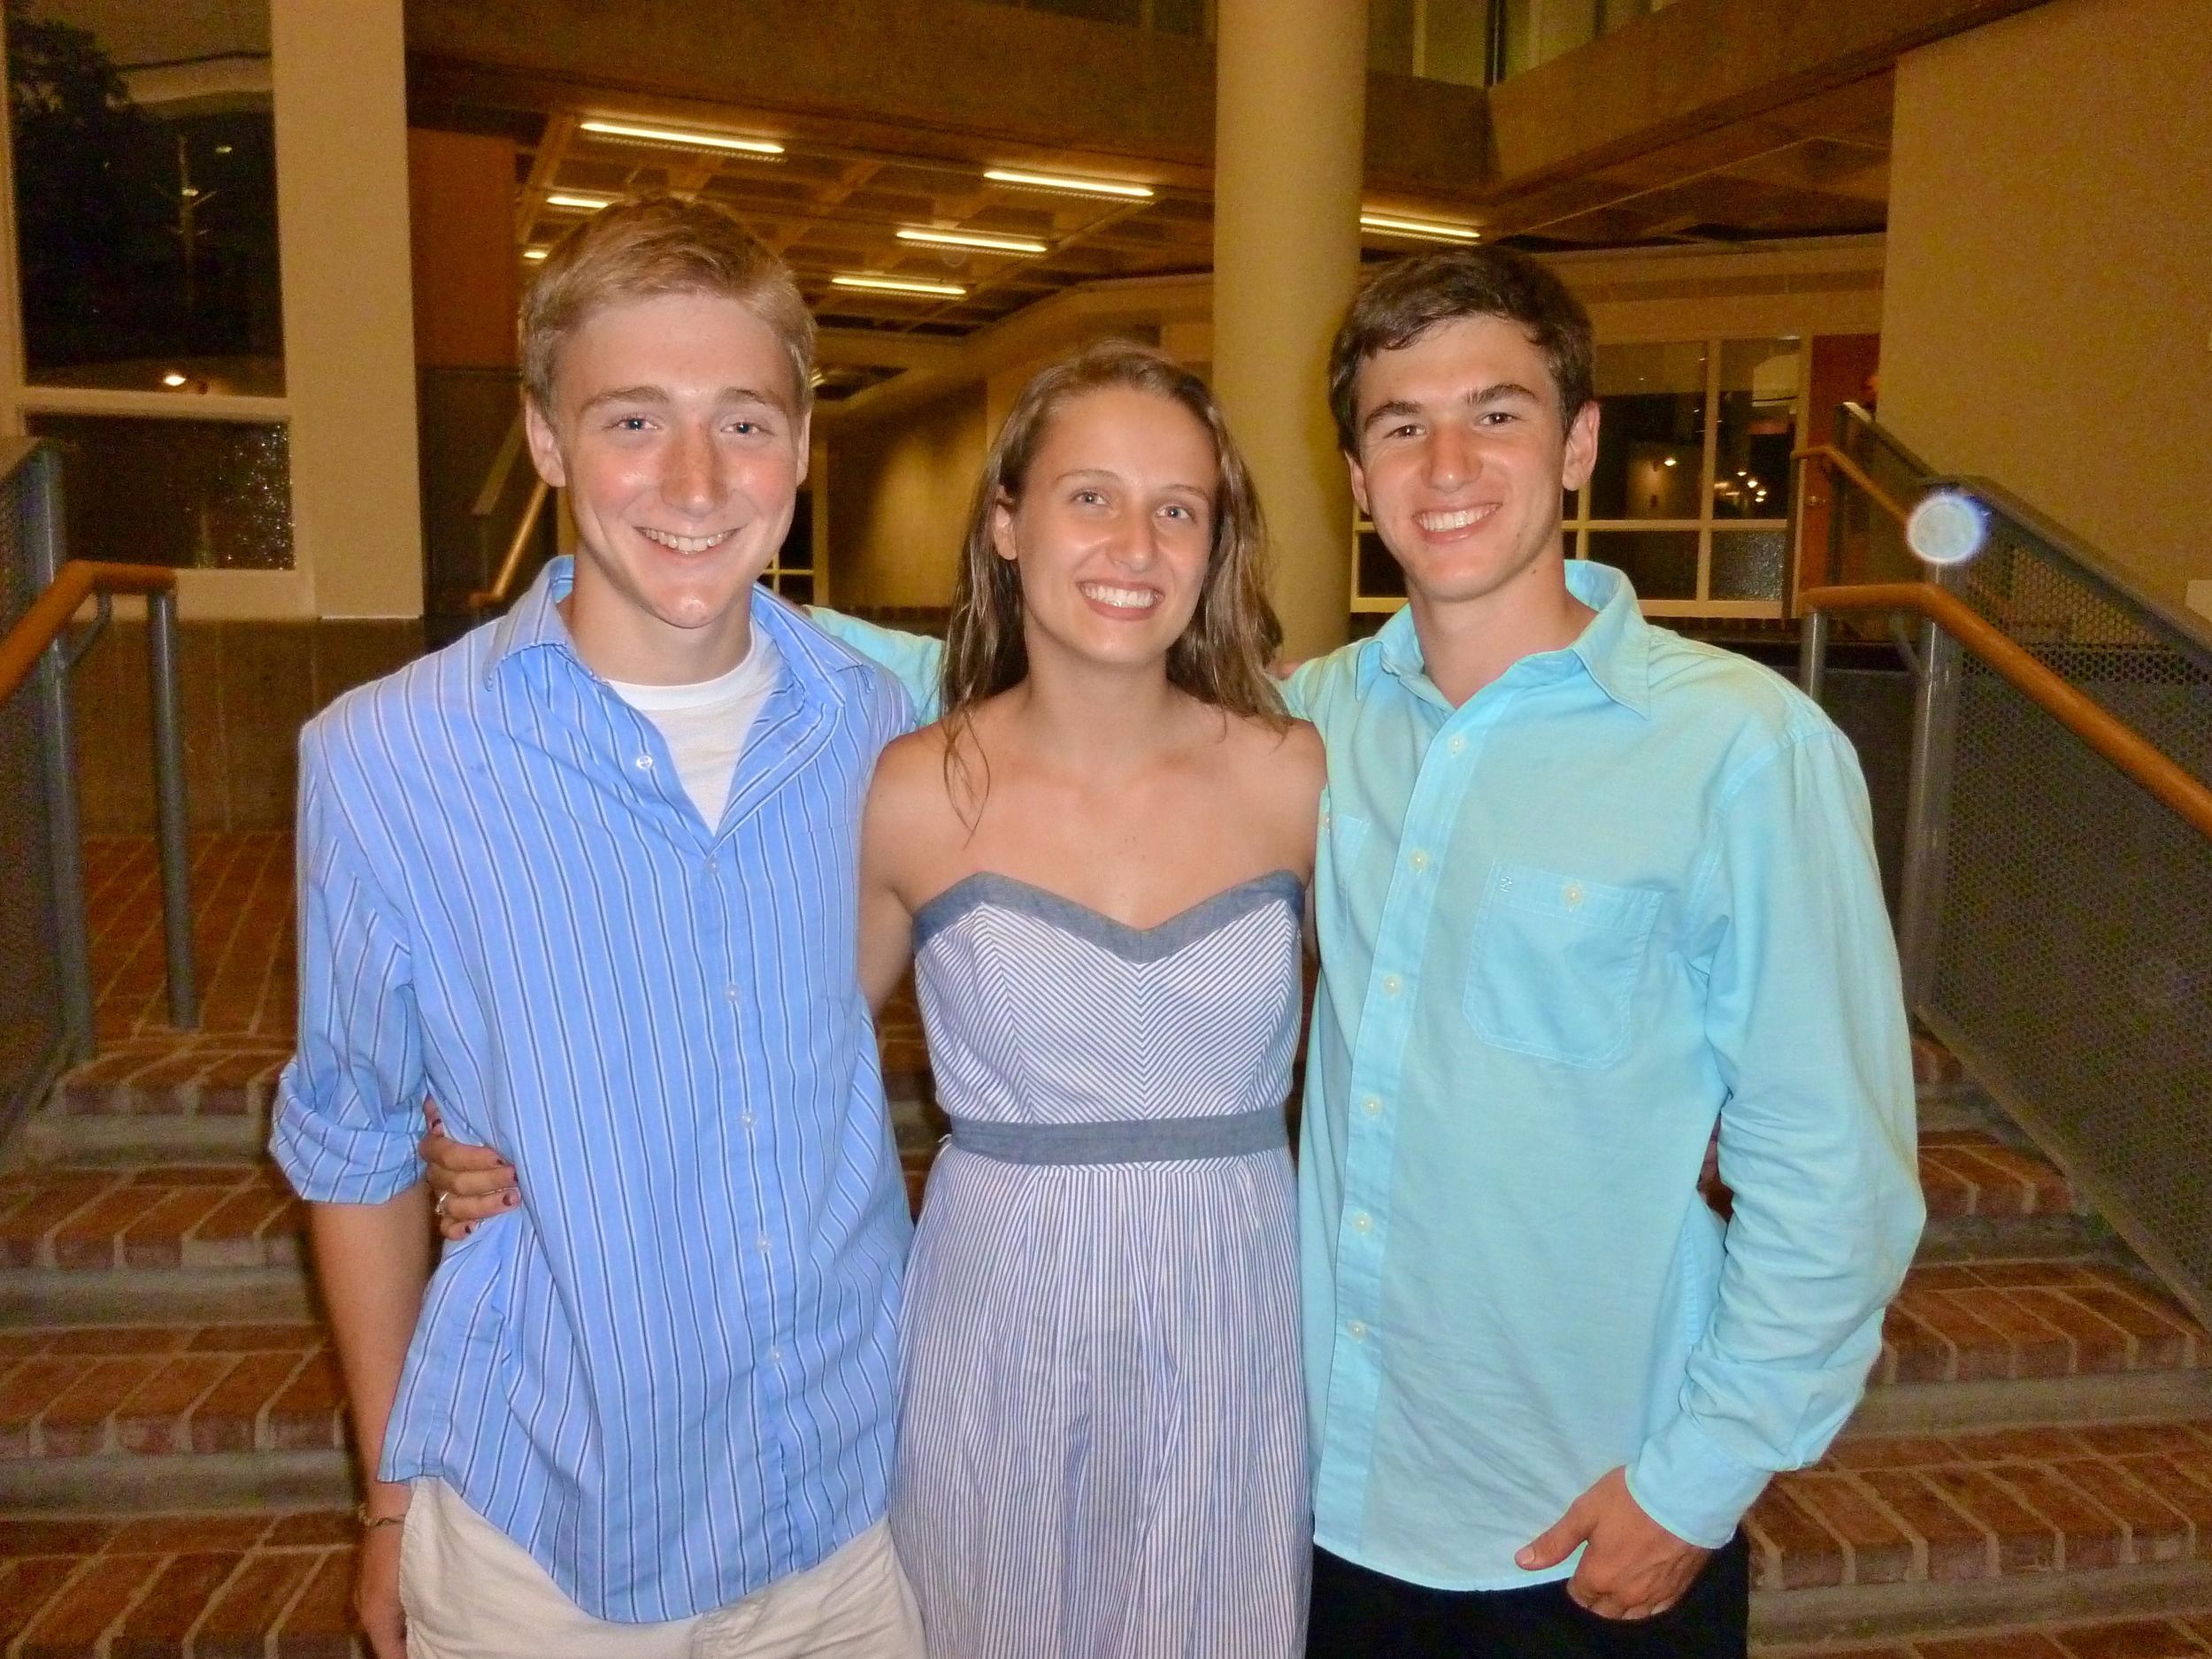 From left: Ryan Dorey '15, Mackenzie Leavenworth '15, and Bryce Lupoli '15